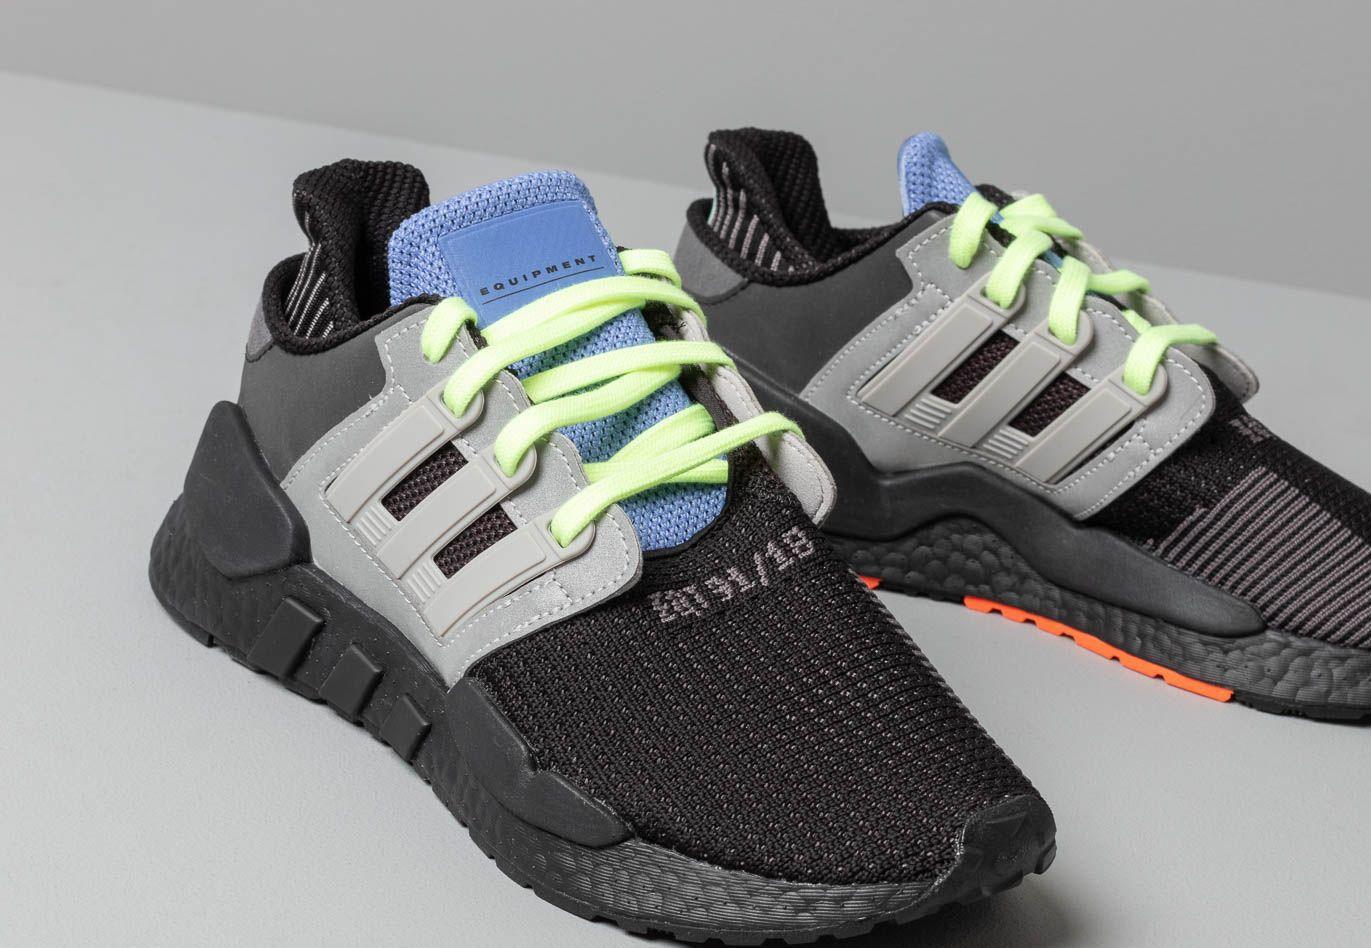 edb550dd5ffdf Adidas Originals - Adidas Eqt Support 91 18 Core Black  Grey Two  Real.  View fullscreen